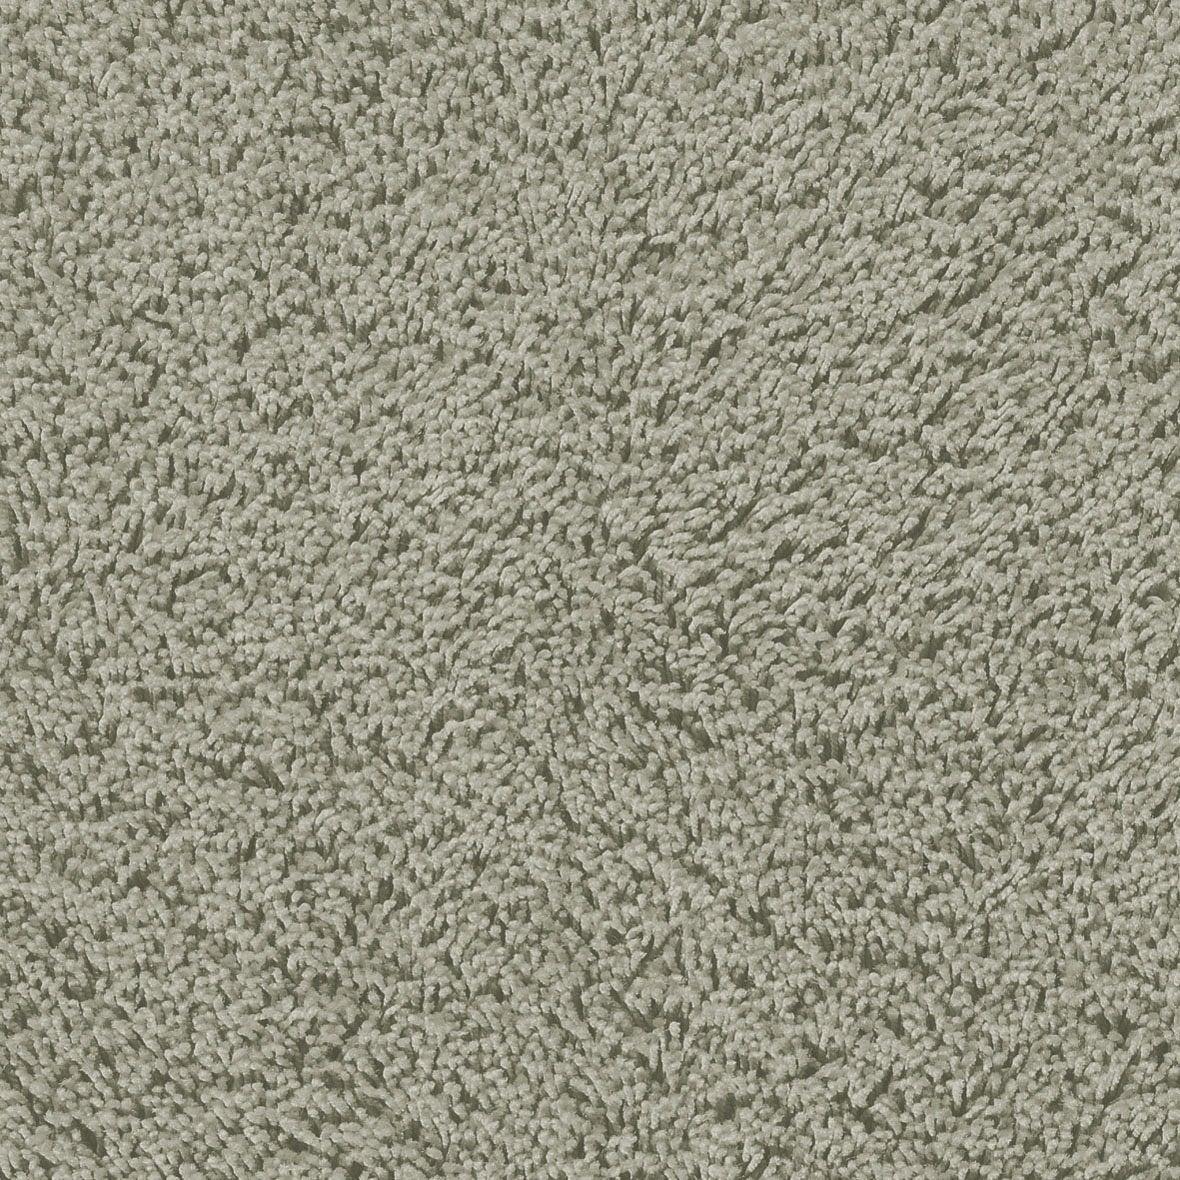 moquette velours imagine grise 4 m leroy merlin. Black Bedroom Furniture Sets. Home Design Ideas